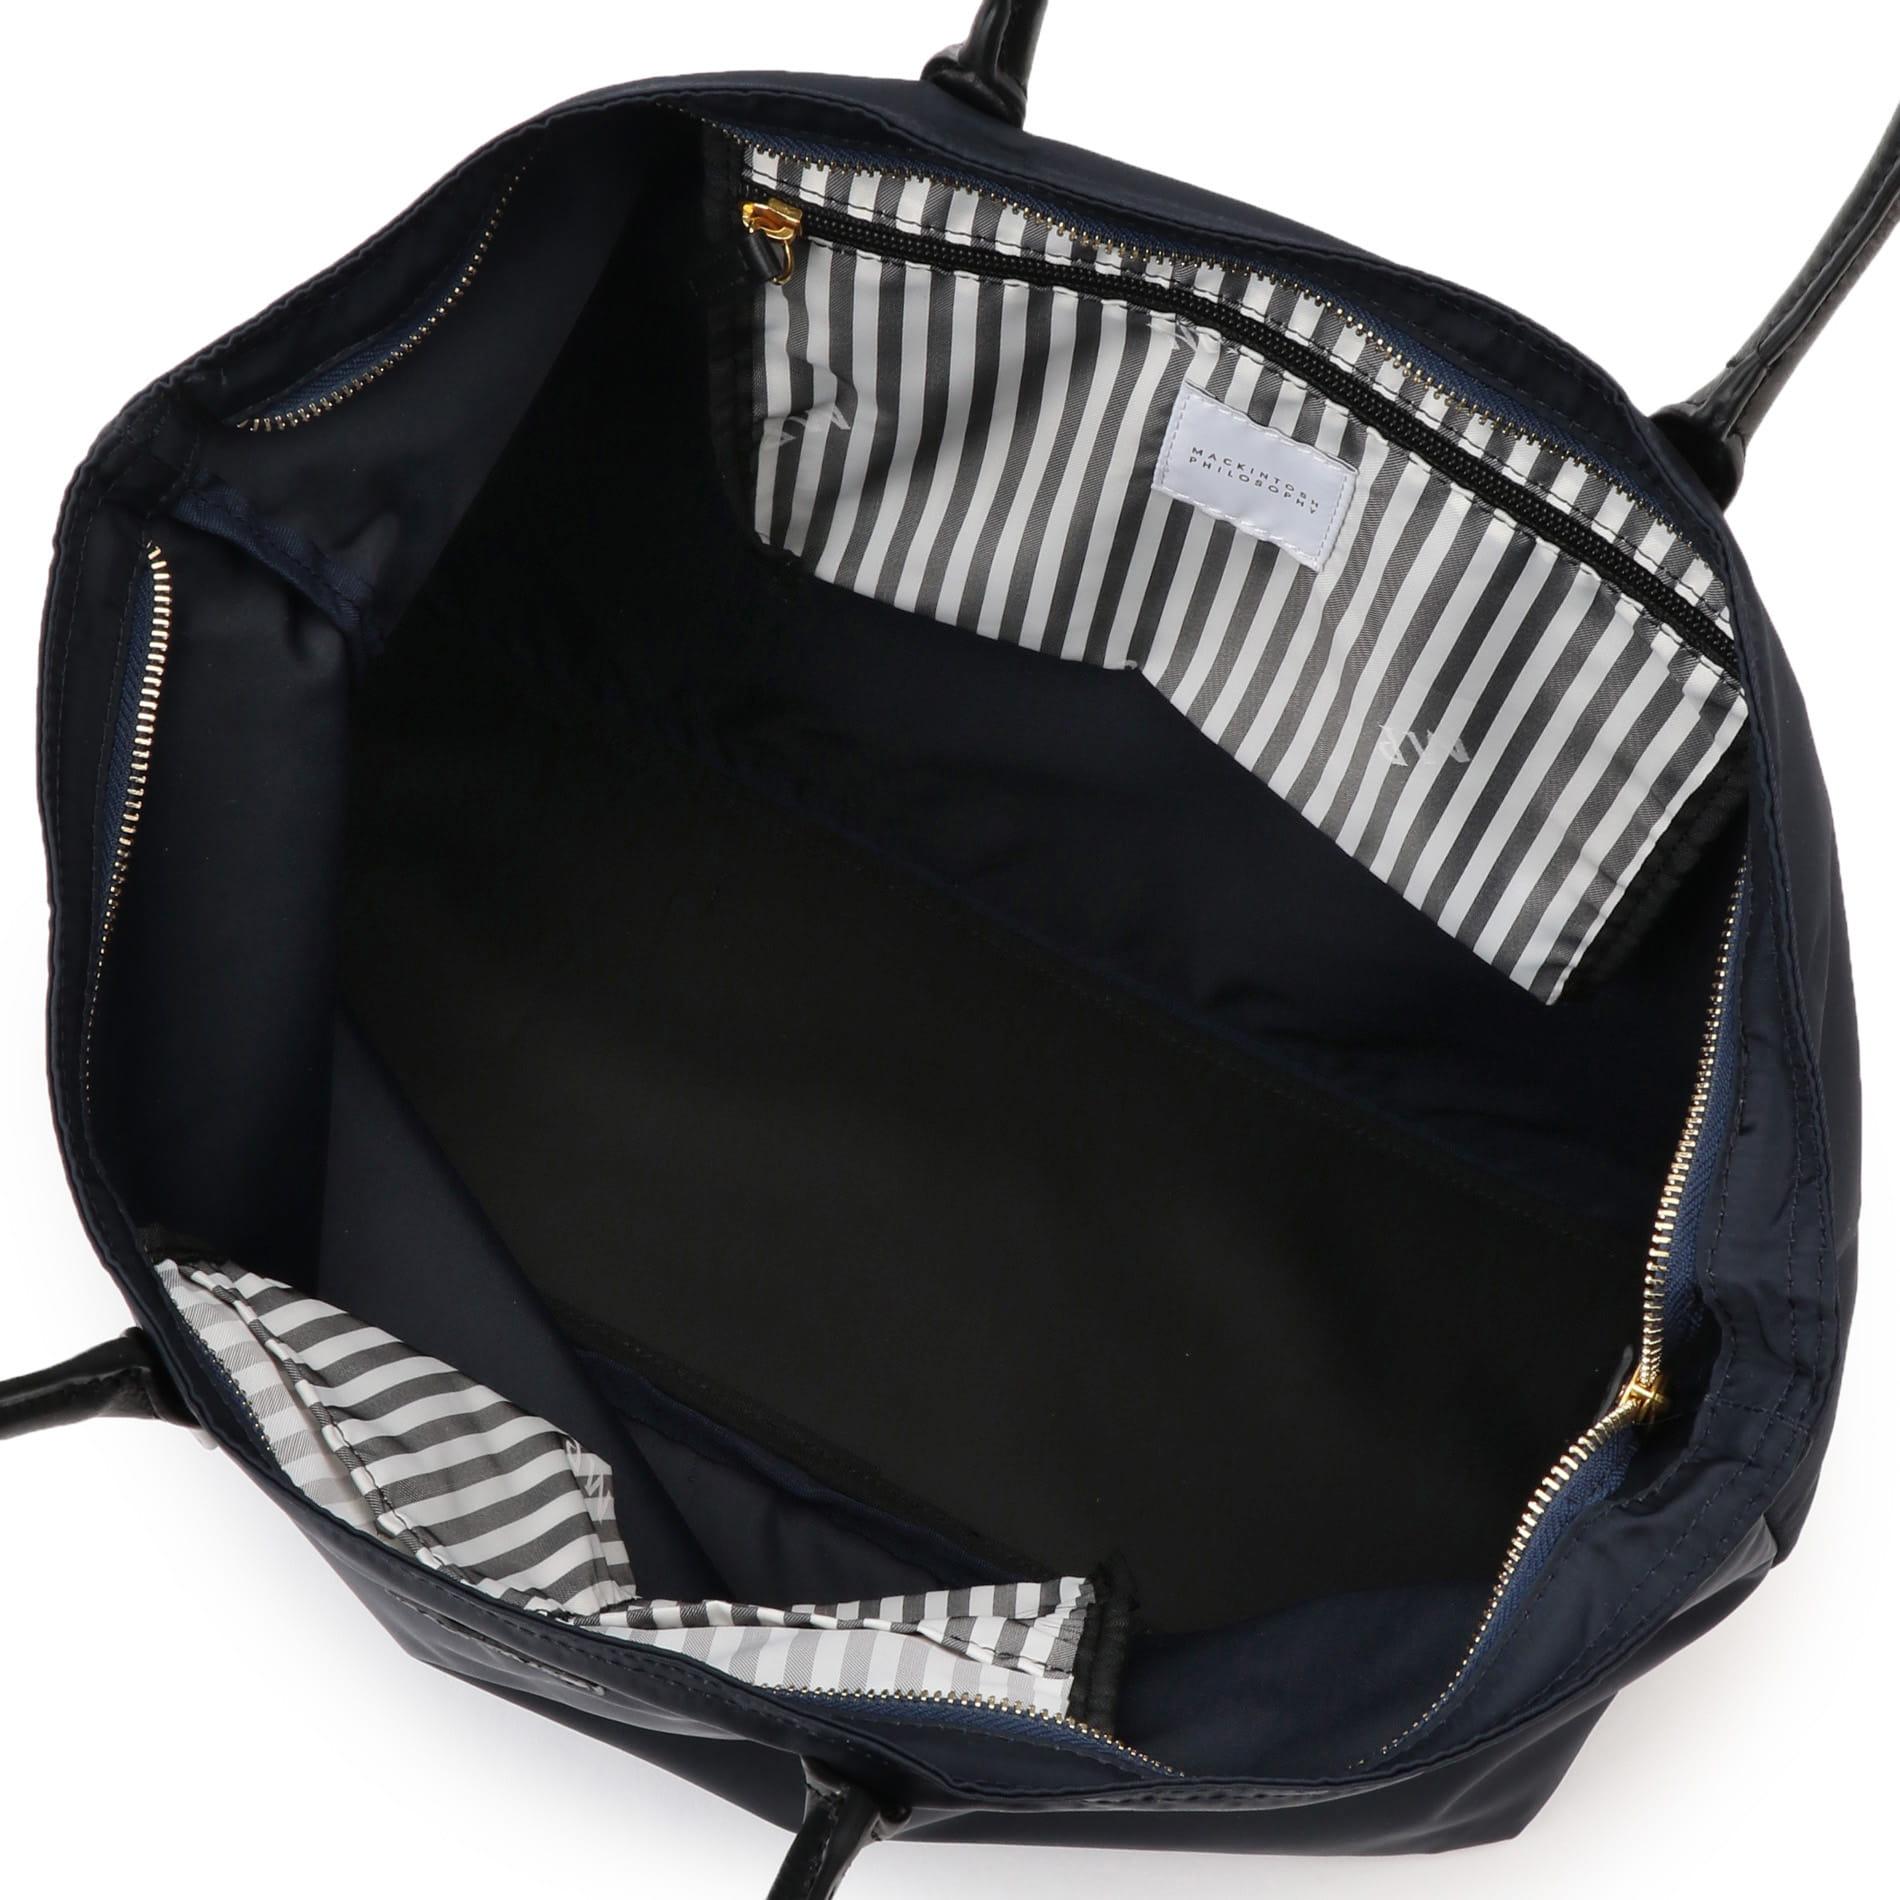 【Chelsea】 ナイロン ライトトートバッグ